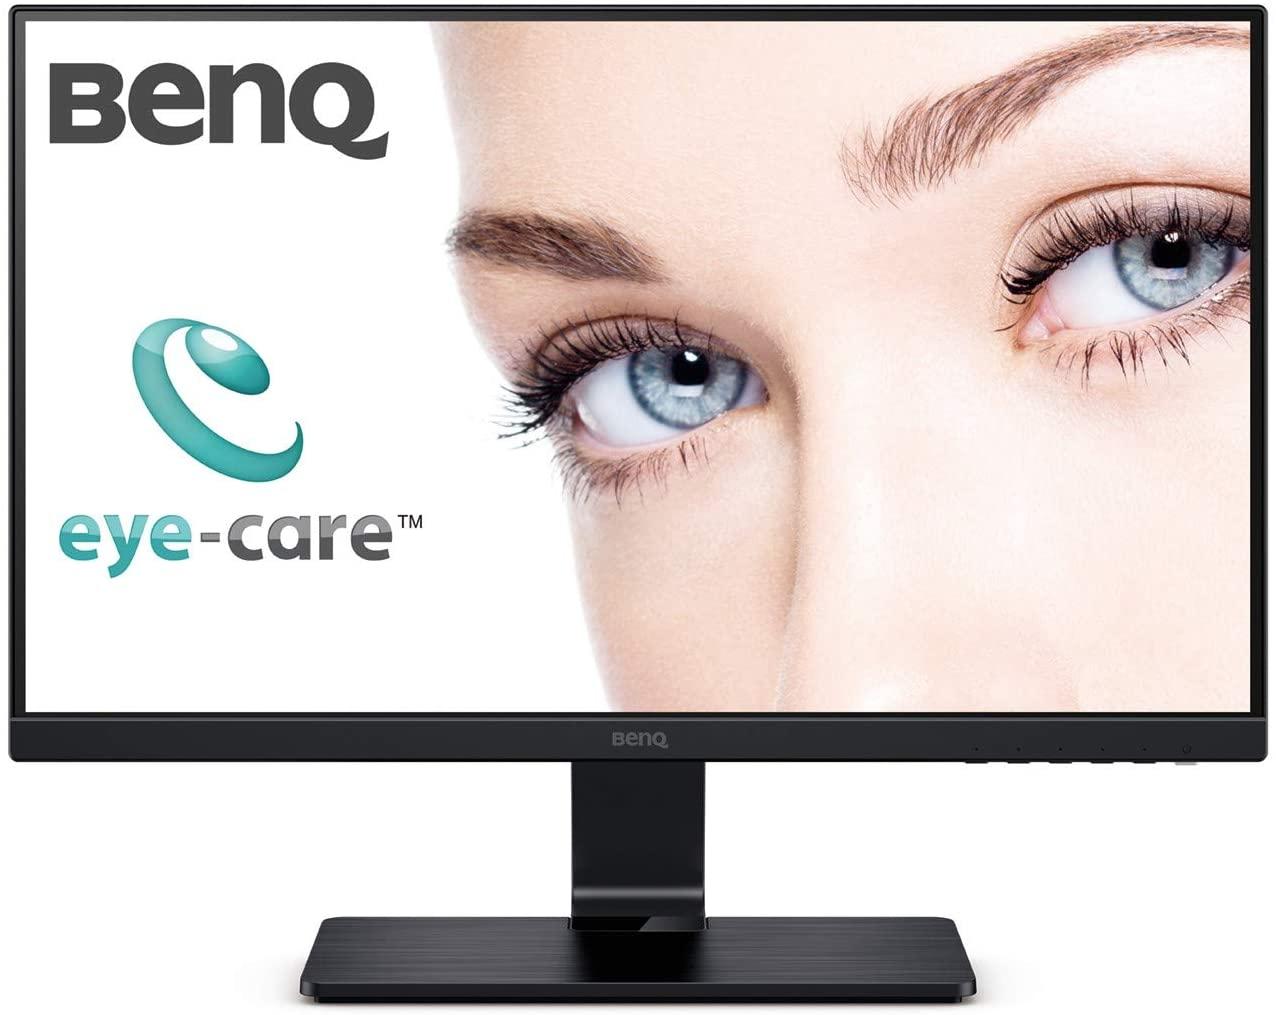 BenQ GW2475H 24-Inch FHD Eye-Care IPS LED Monitor, HDMI, Slim Bezel ,black - £88.98 @ Amazon